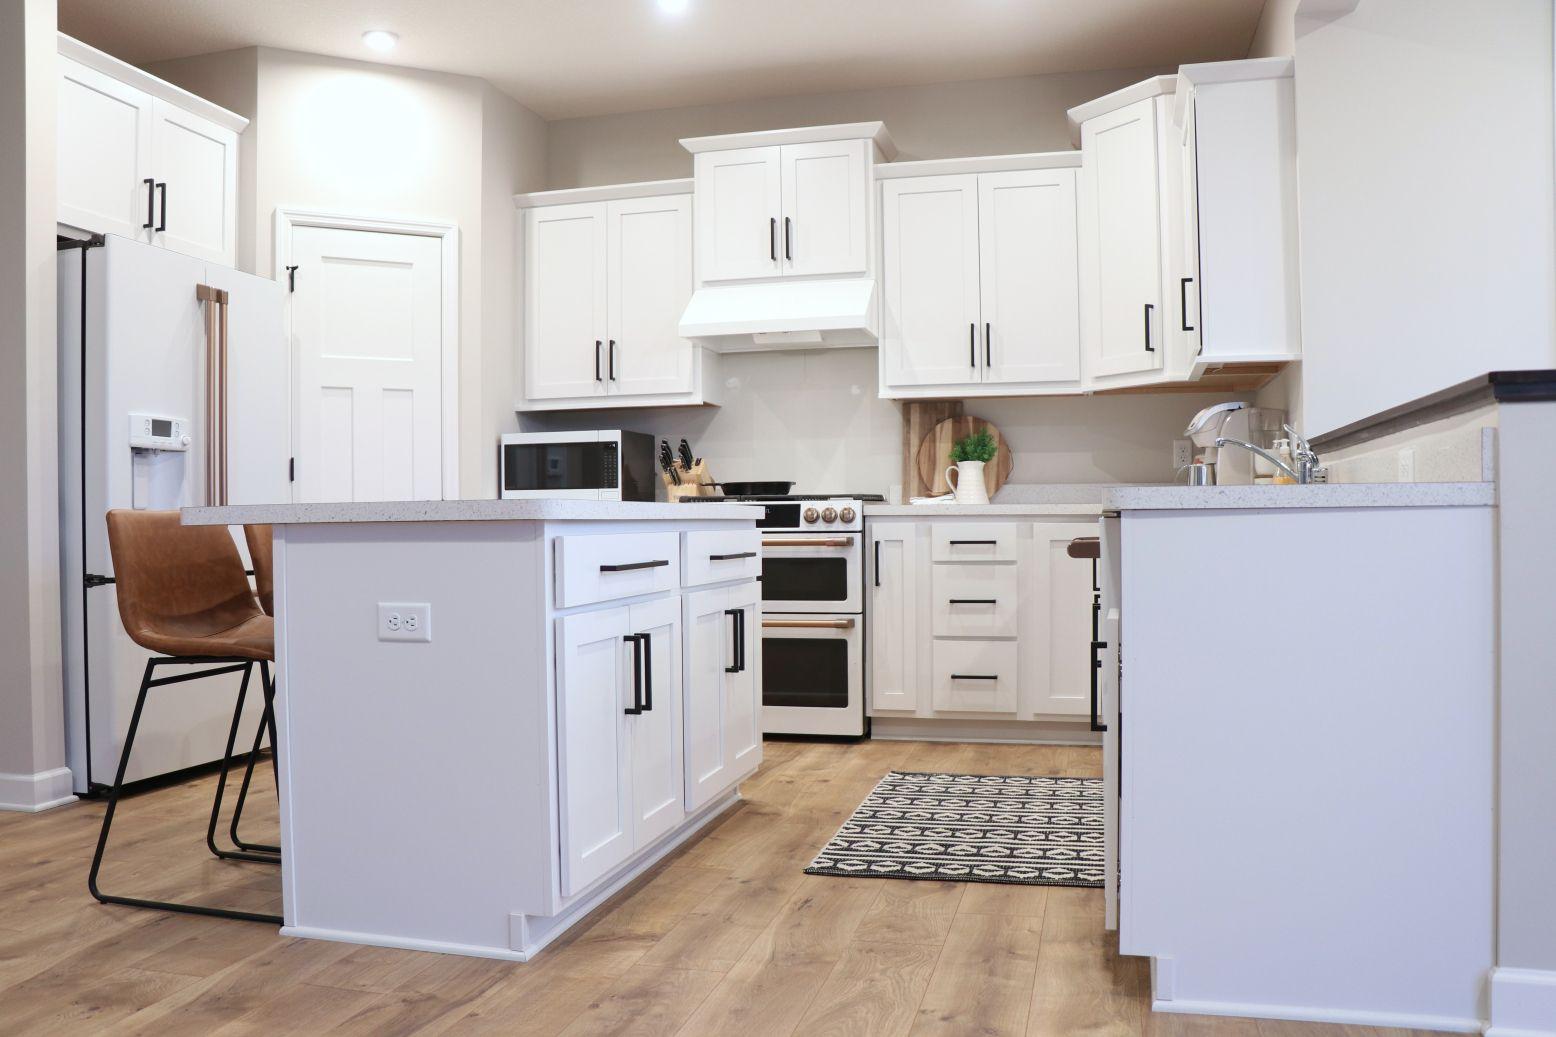 diy or buy: cabinet hardware | buy cabinets, cabinet hardware, modern farmhouse kitchens